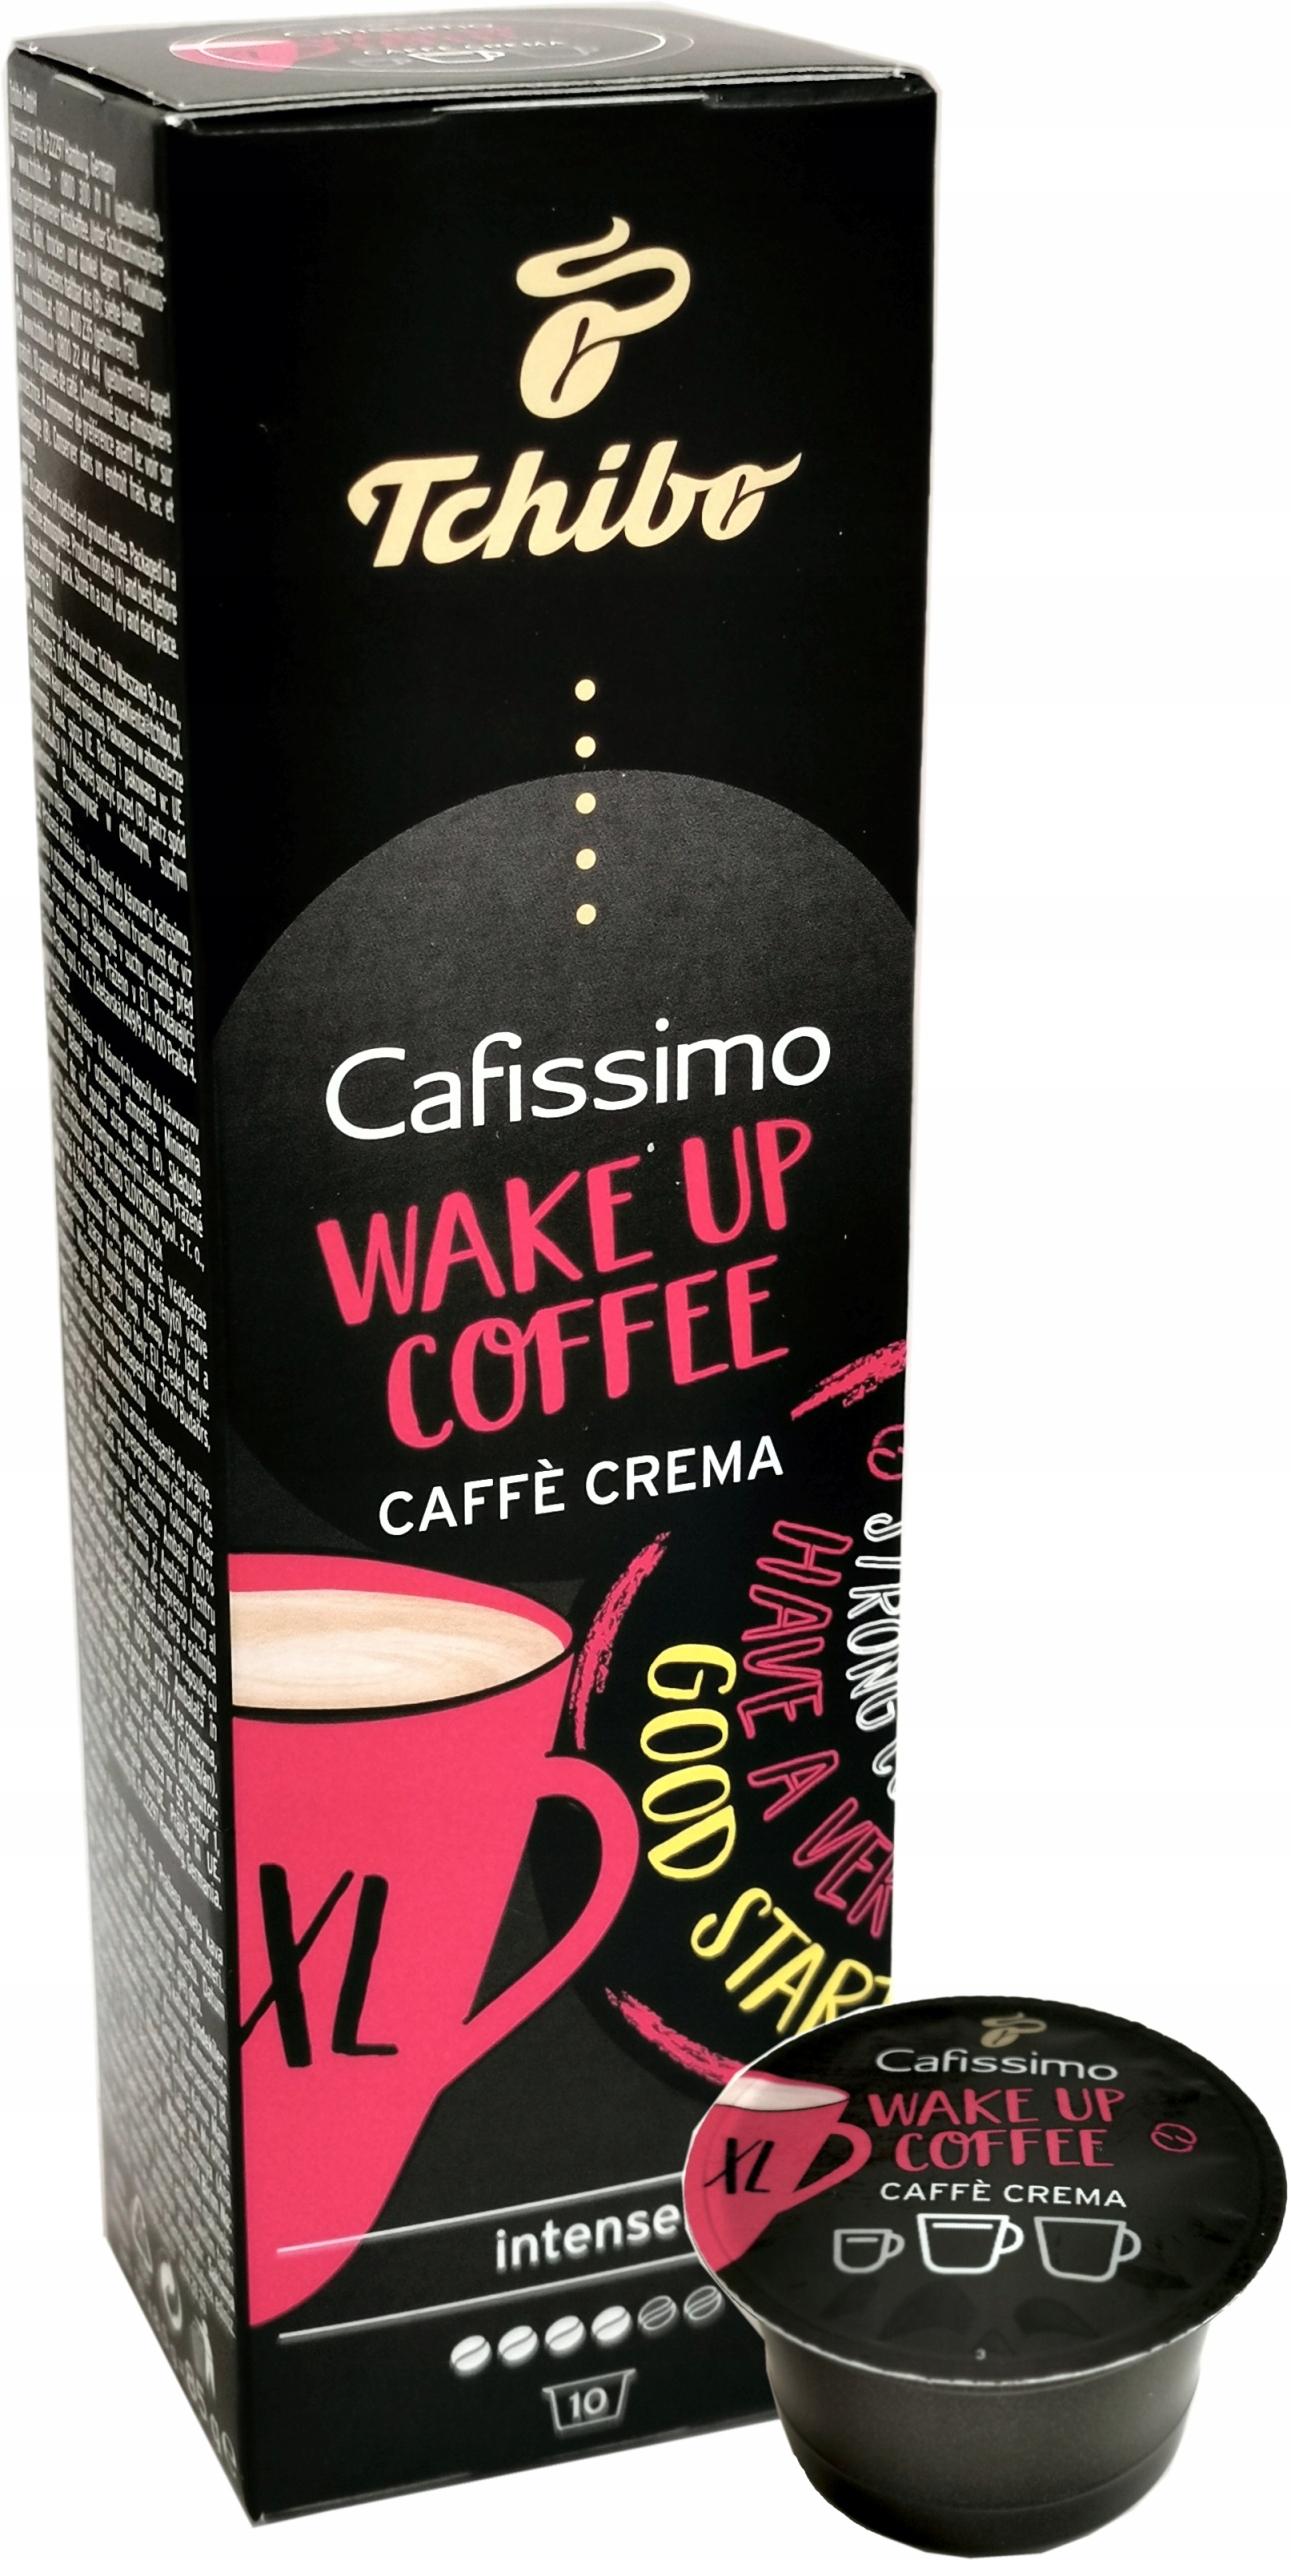 KAWA TCHIBO CAFISSIMO WAKE UP COFFEE CRAMA XL 10